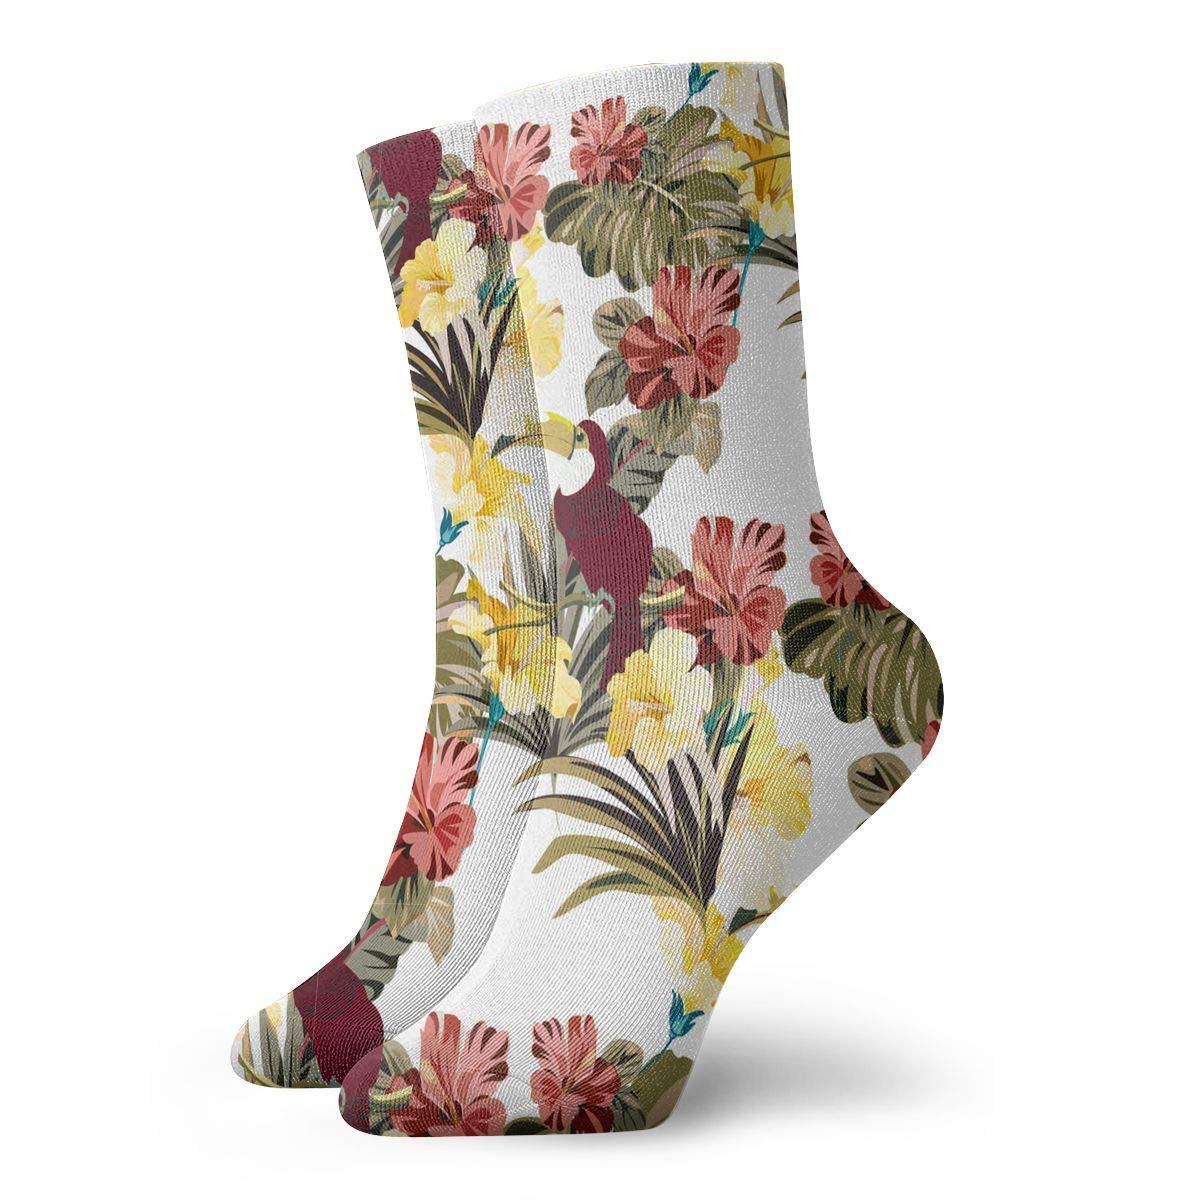 The Brightly Colored Jungle Of Birds Fashion Dress Socks Short Socks Leisure Travel 11.8 Inch